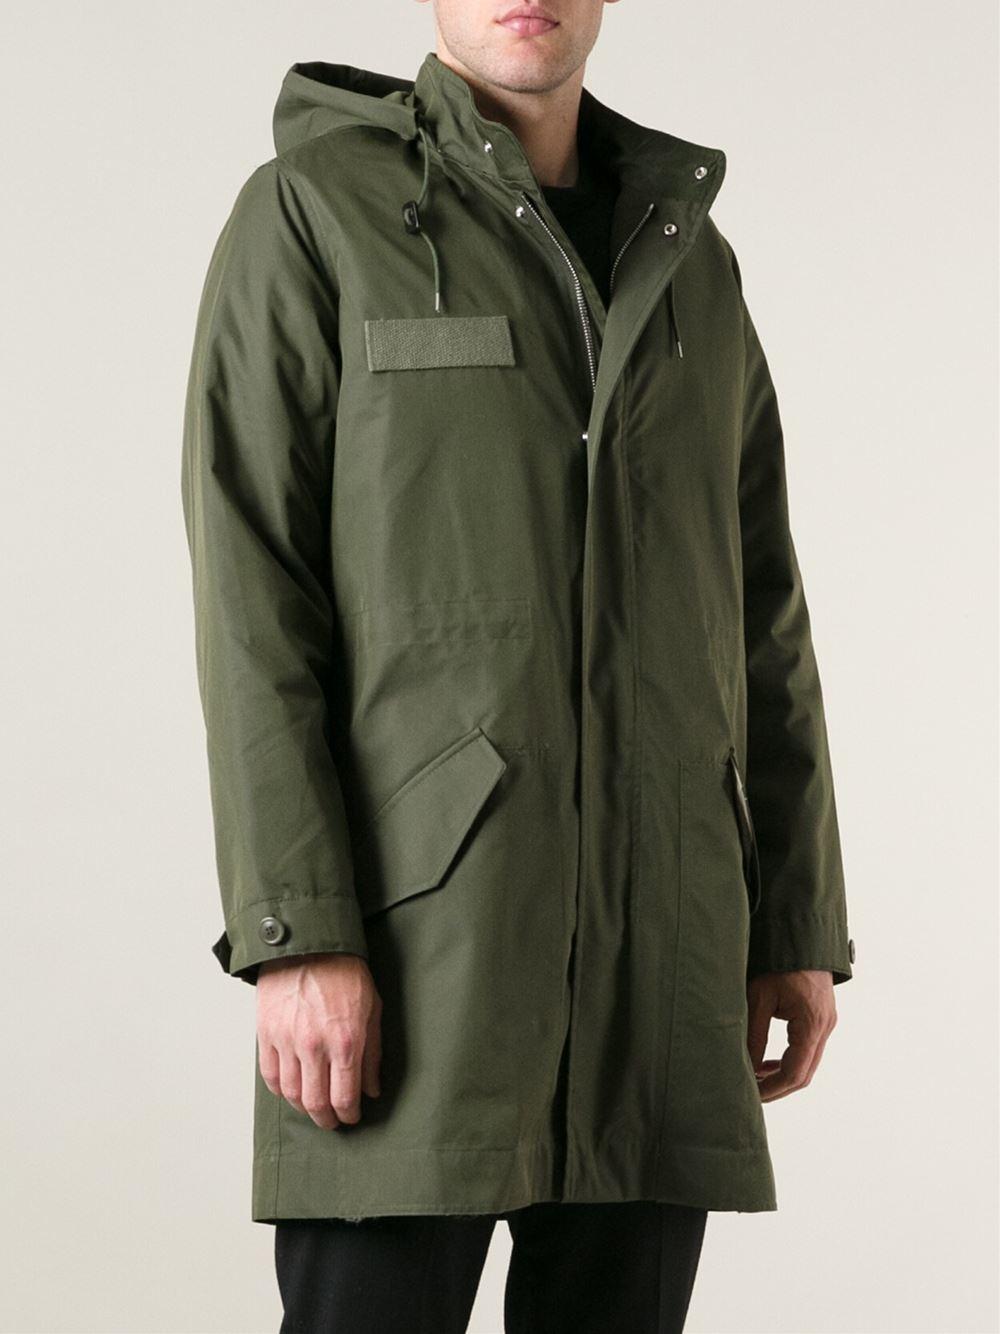 A.p.c. Light Parka Coat in Green for Men | Lyst